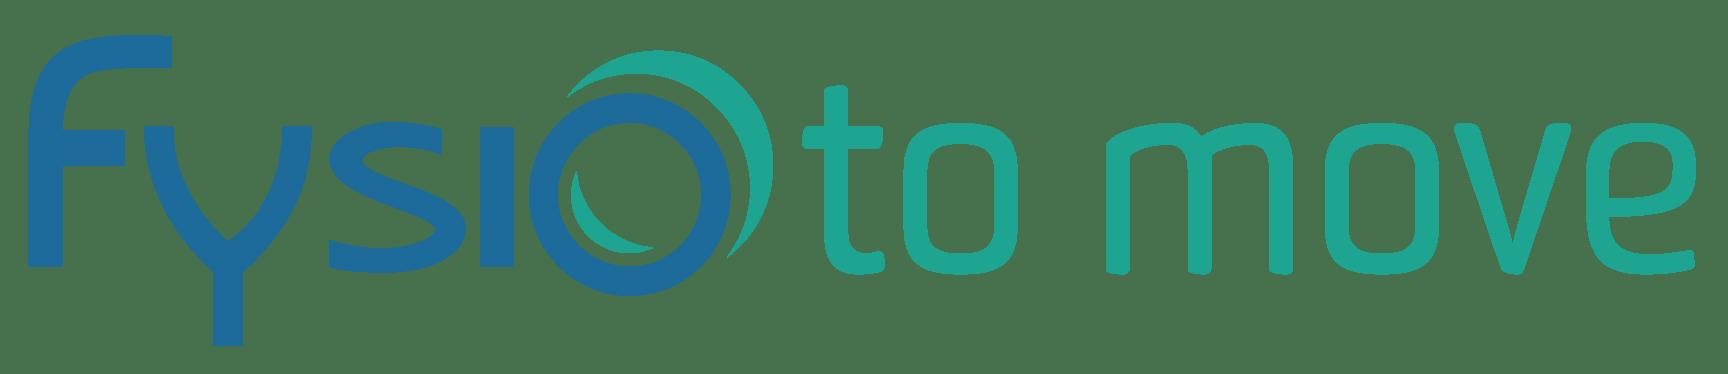 FTM logo breed zonder slogan 2019 - Blauw-Groen RGB-01